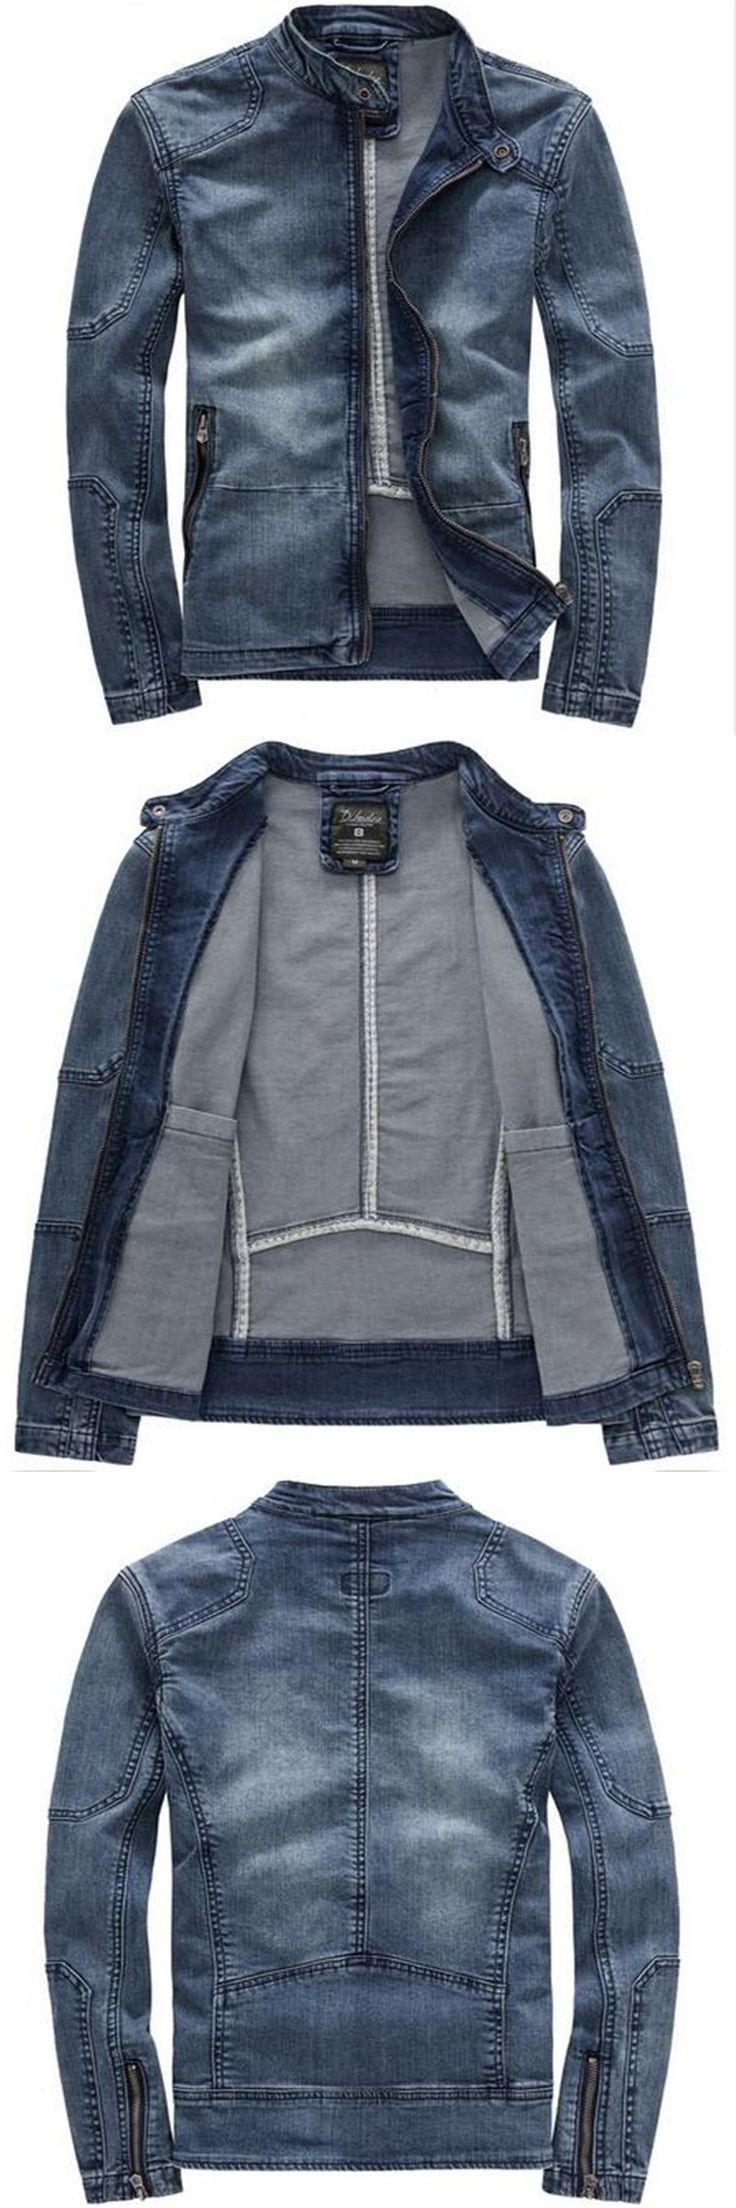 2017 Denim Jacket Youth Autumn Jacket Clothes Men'S Autumn Slim Fashion Casual Jacket Popular Denim Jacket Popular Clothes A2087